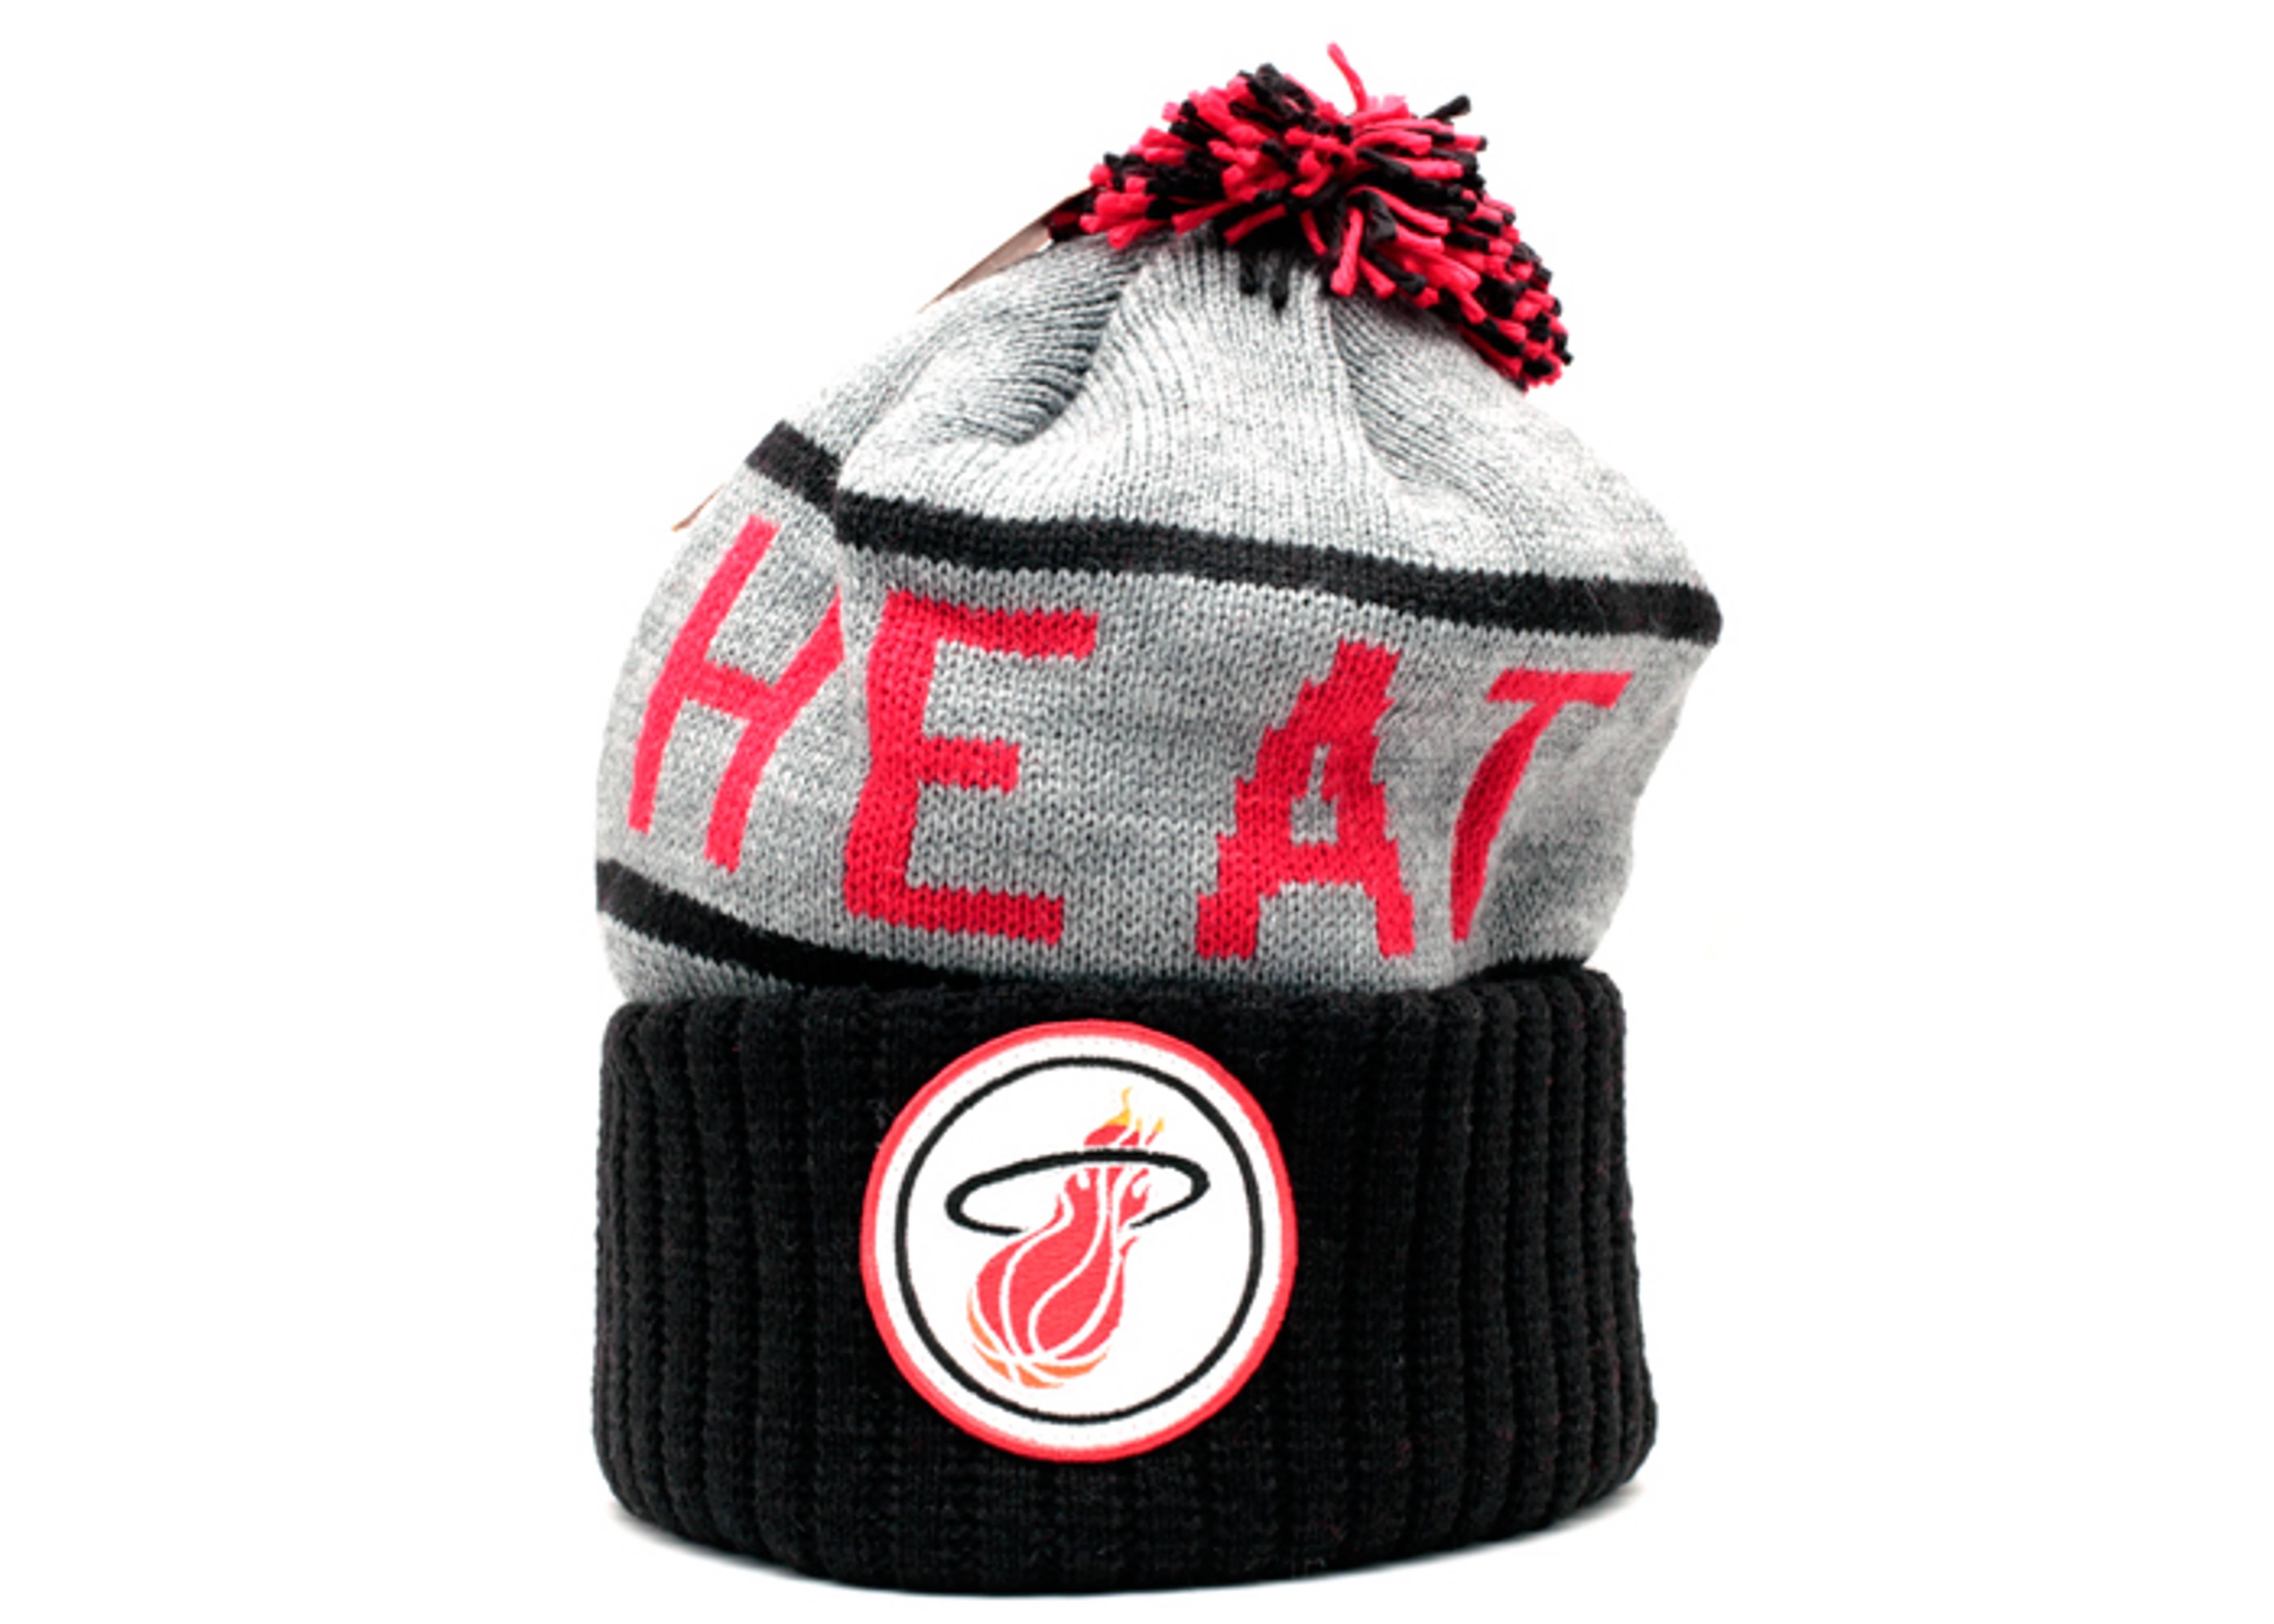 dd3c91d5 Miami Heat Cuffed Pom Knit Beanie - Mitchell & Ness - kj46gte5heat ...